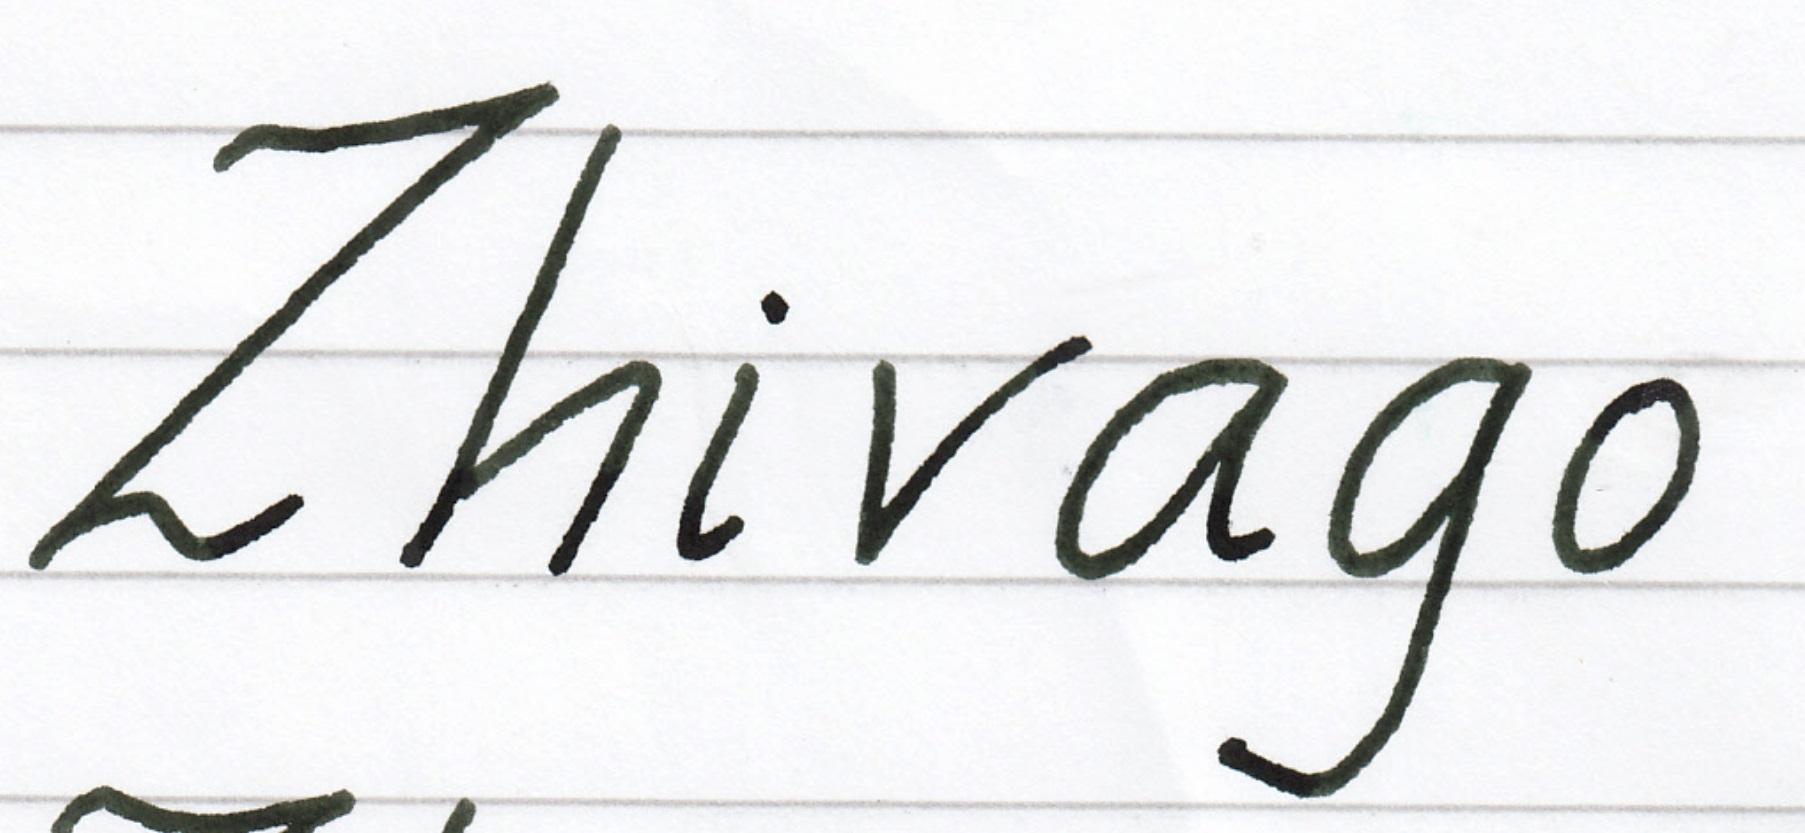 fpn_1453636416__zhivago_lyreco_4.jpg